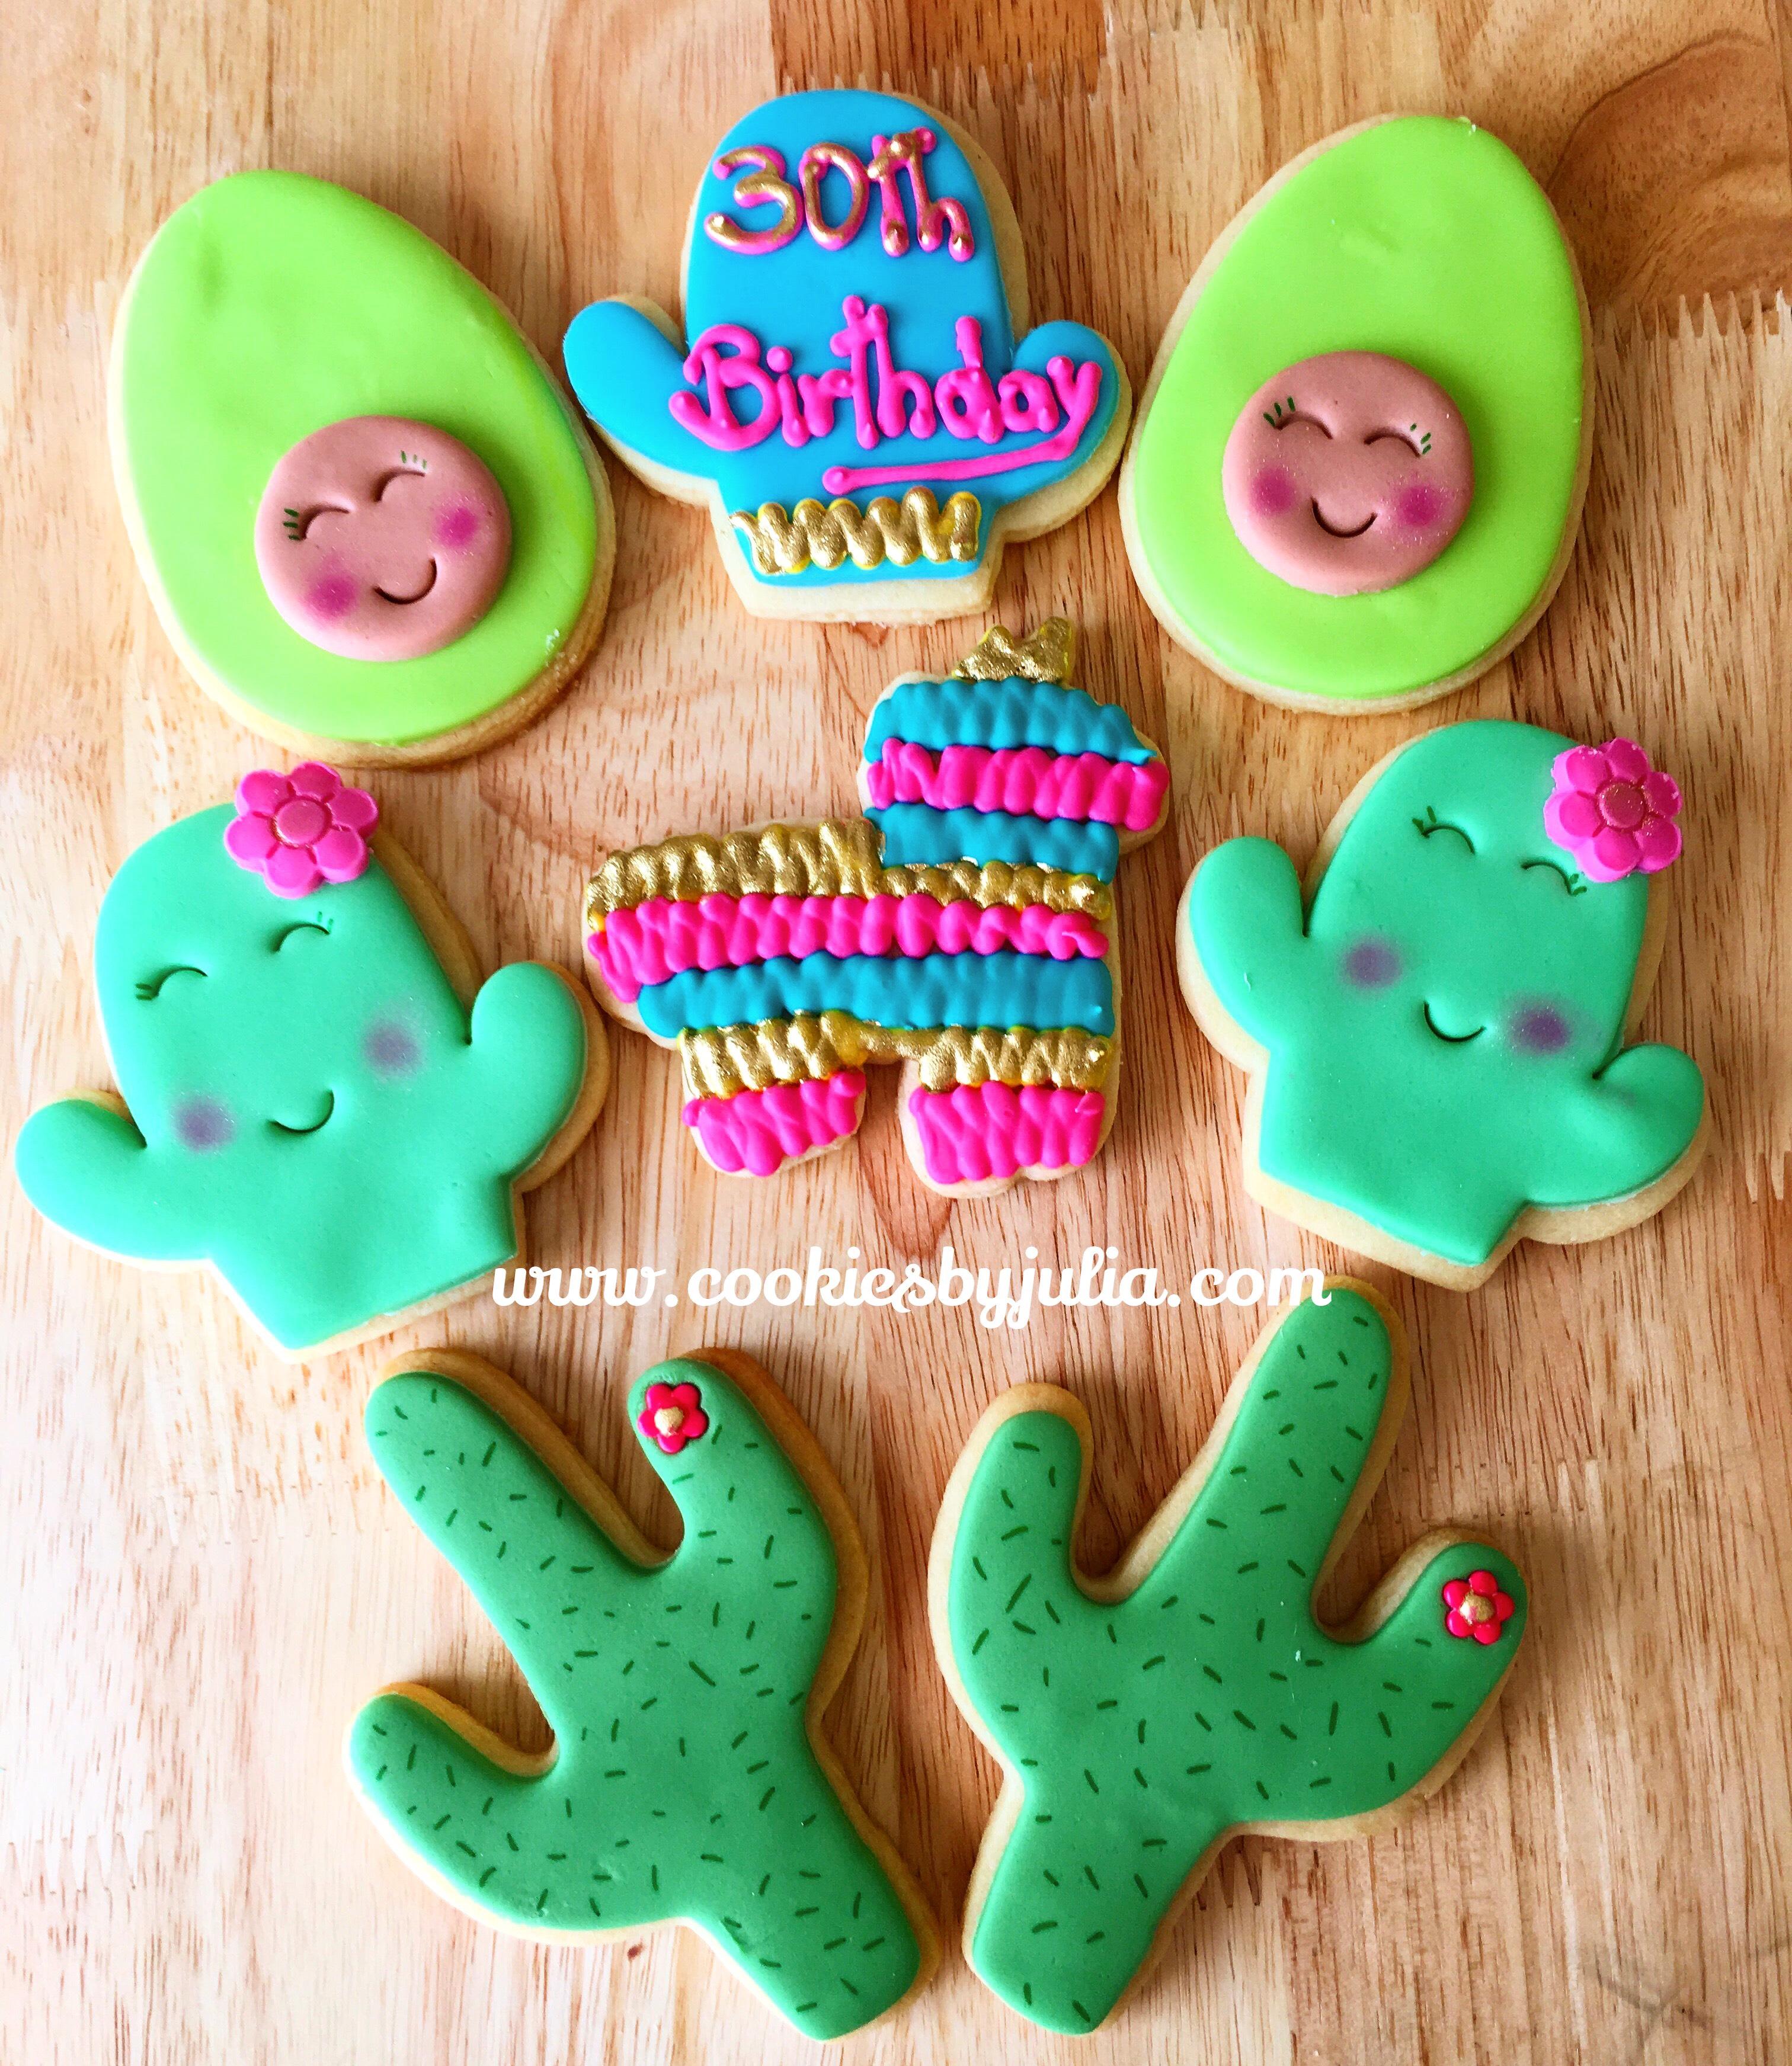 Green fondant cactus cookies